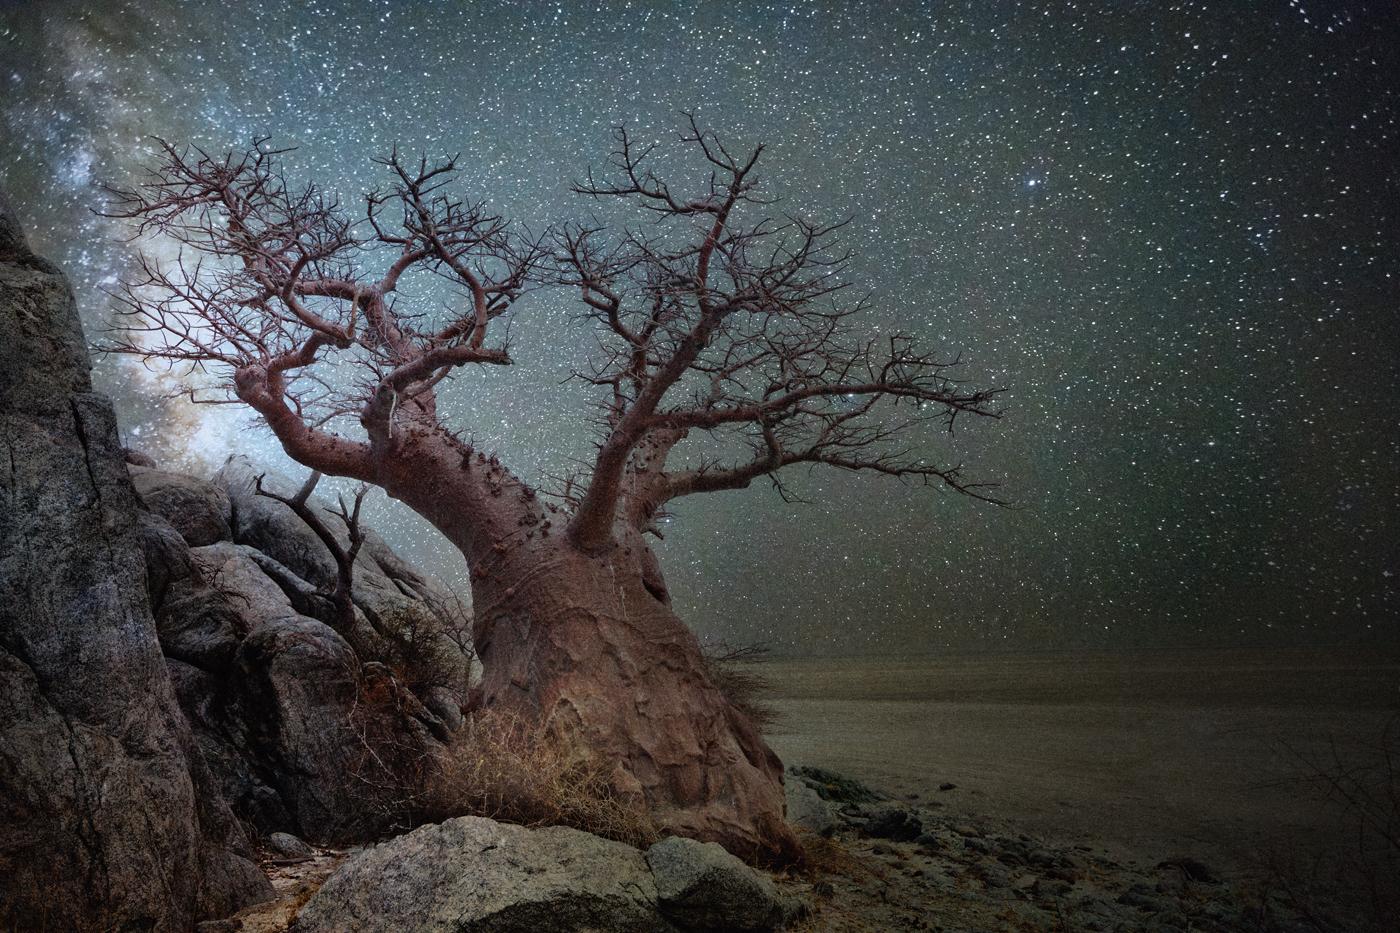 beth-moon-vieu-arbre-etoile-06